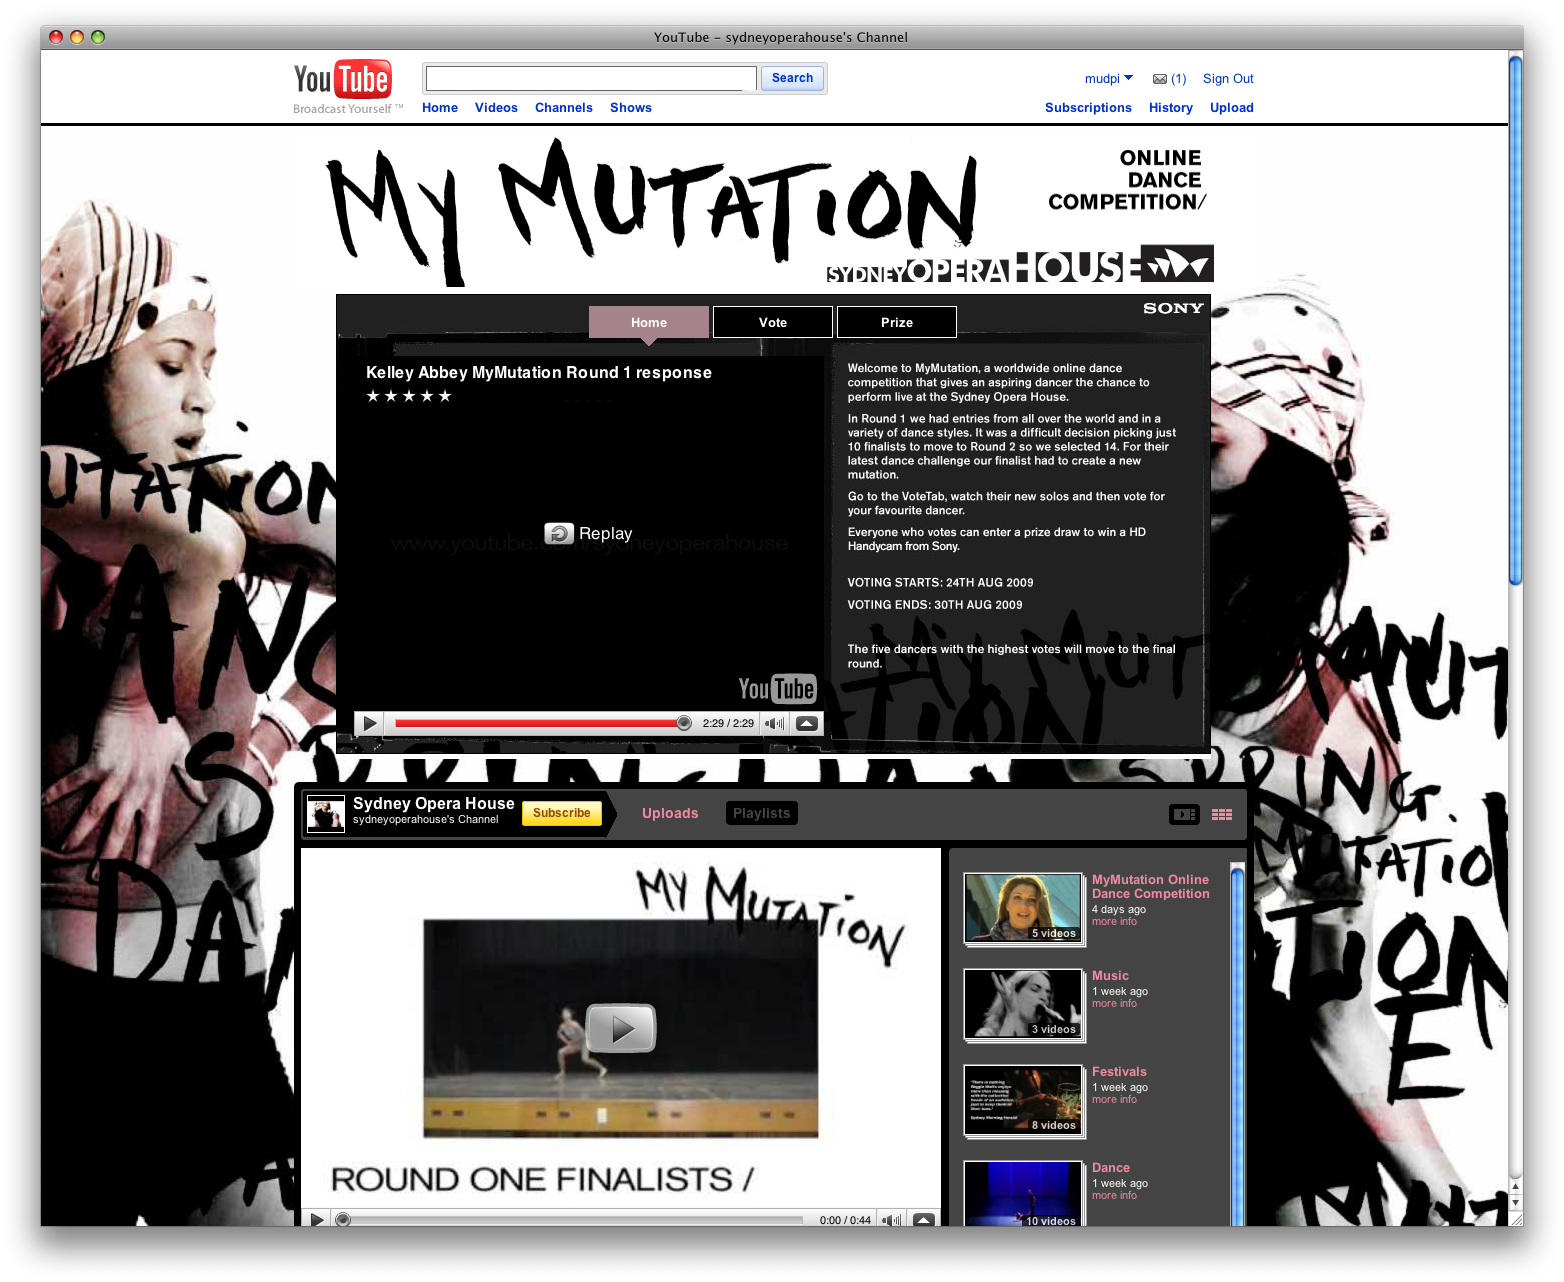 Mymutation